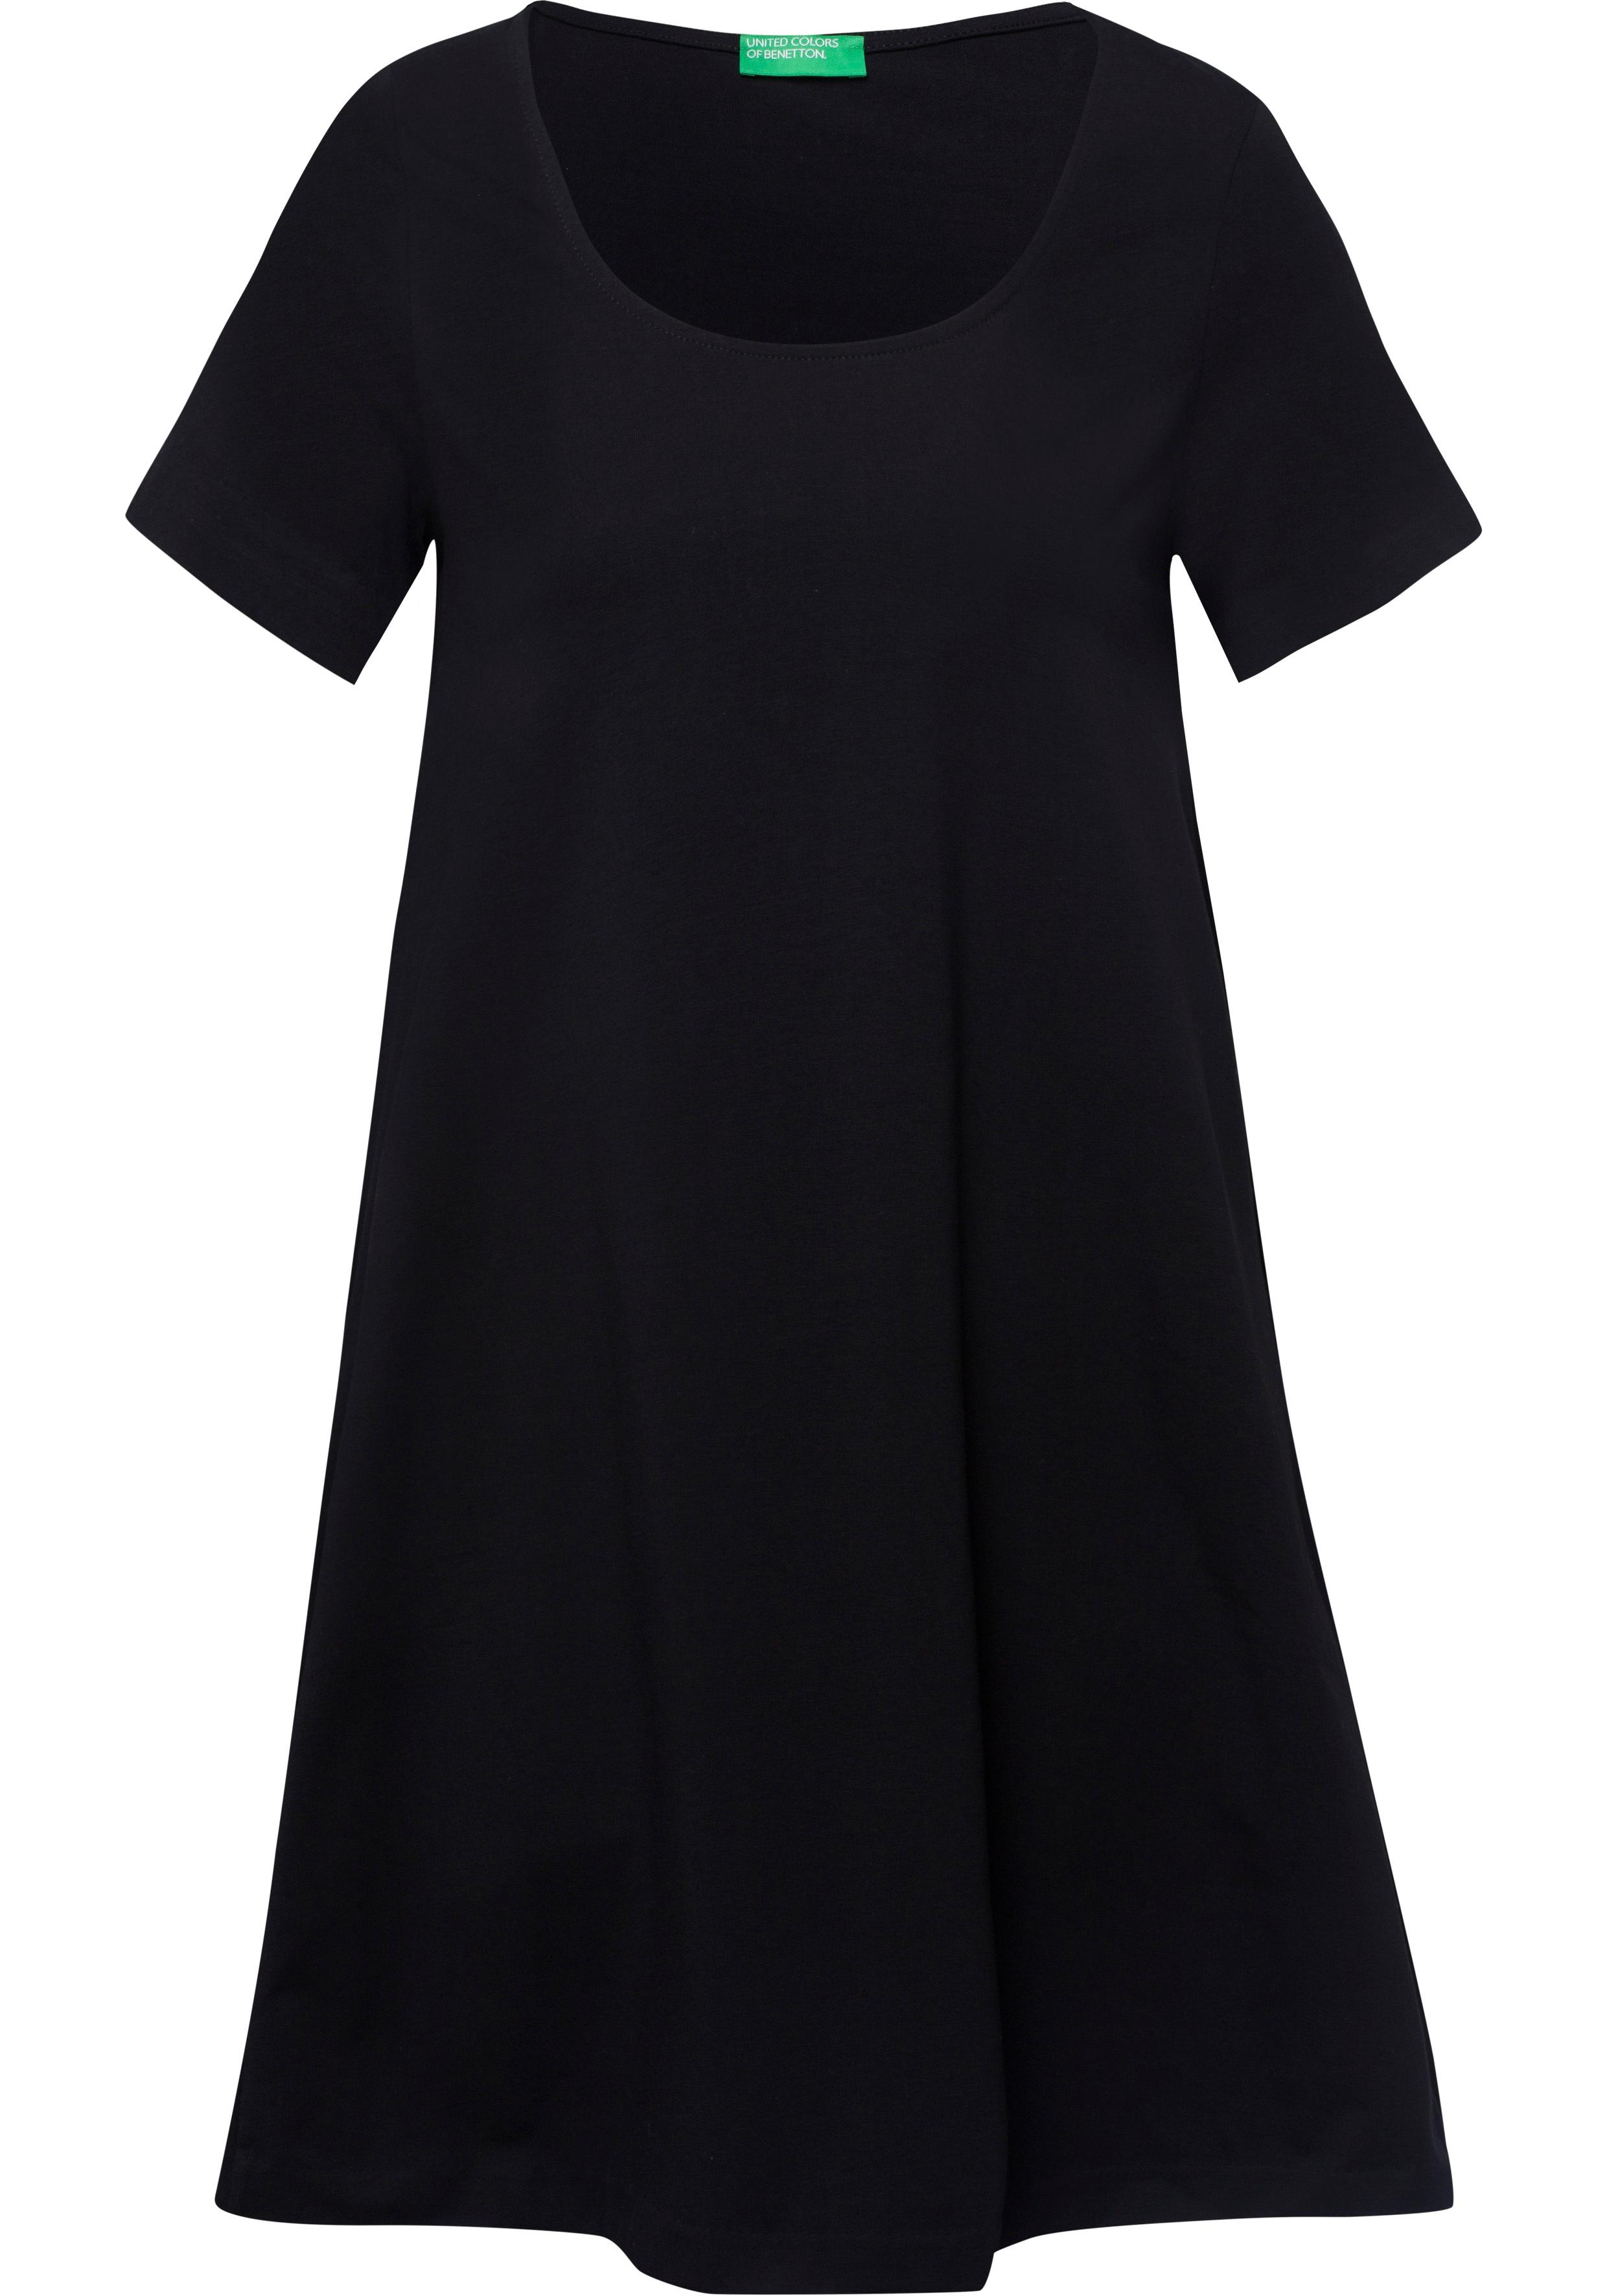 united colors of benetton -  Jerseykleid